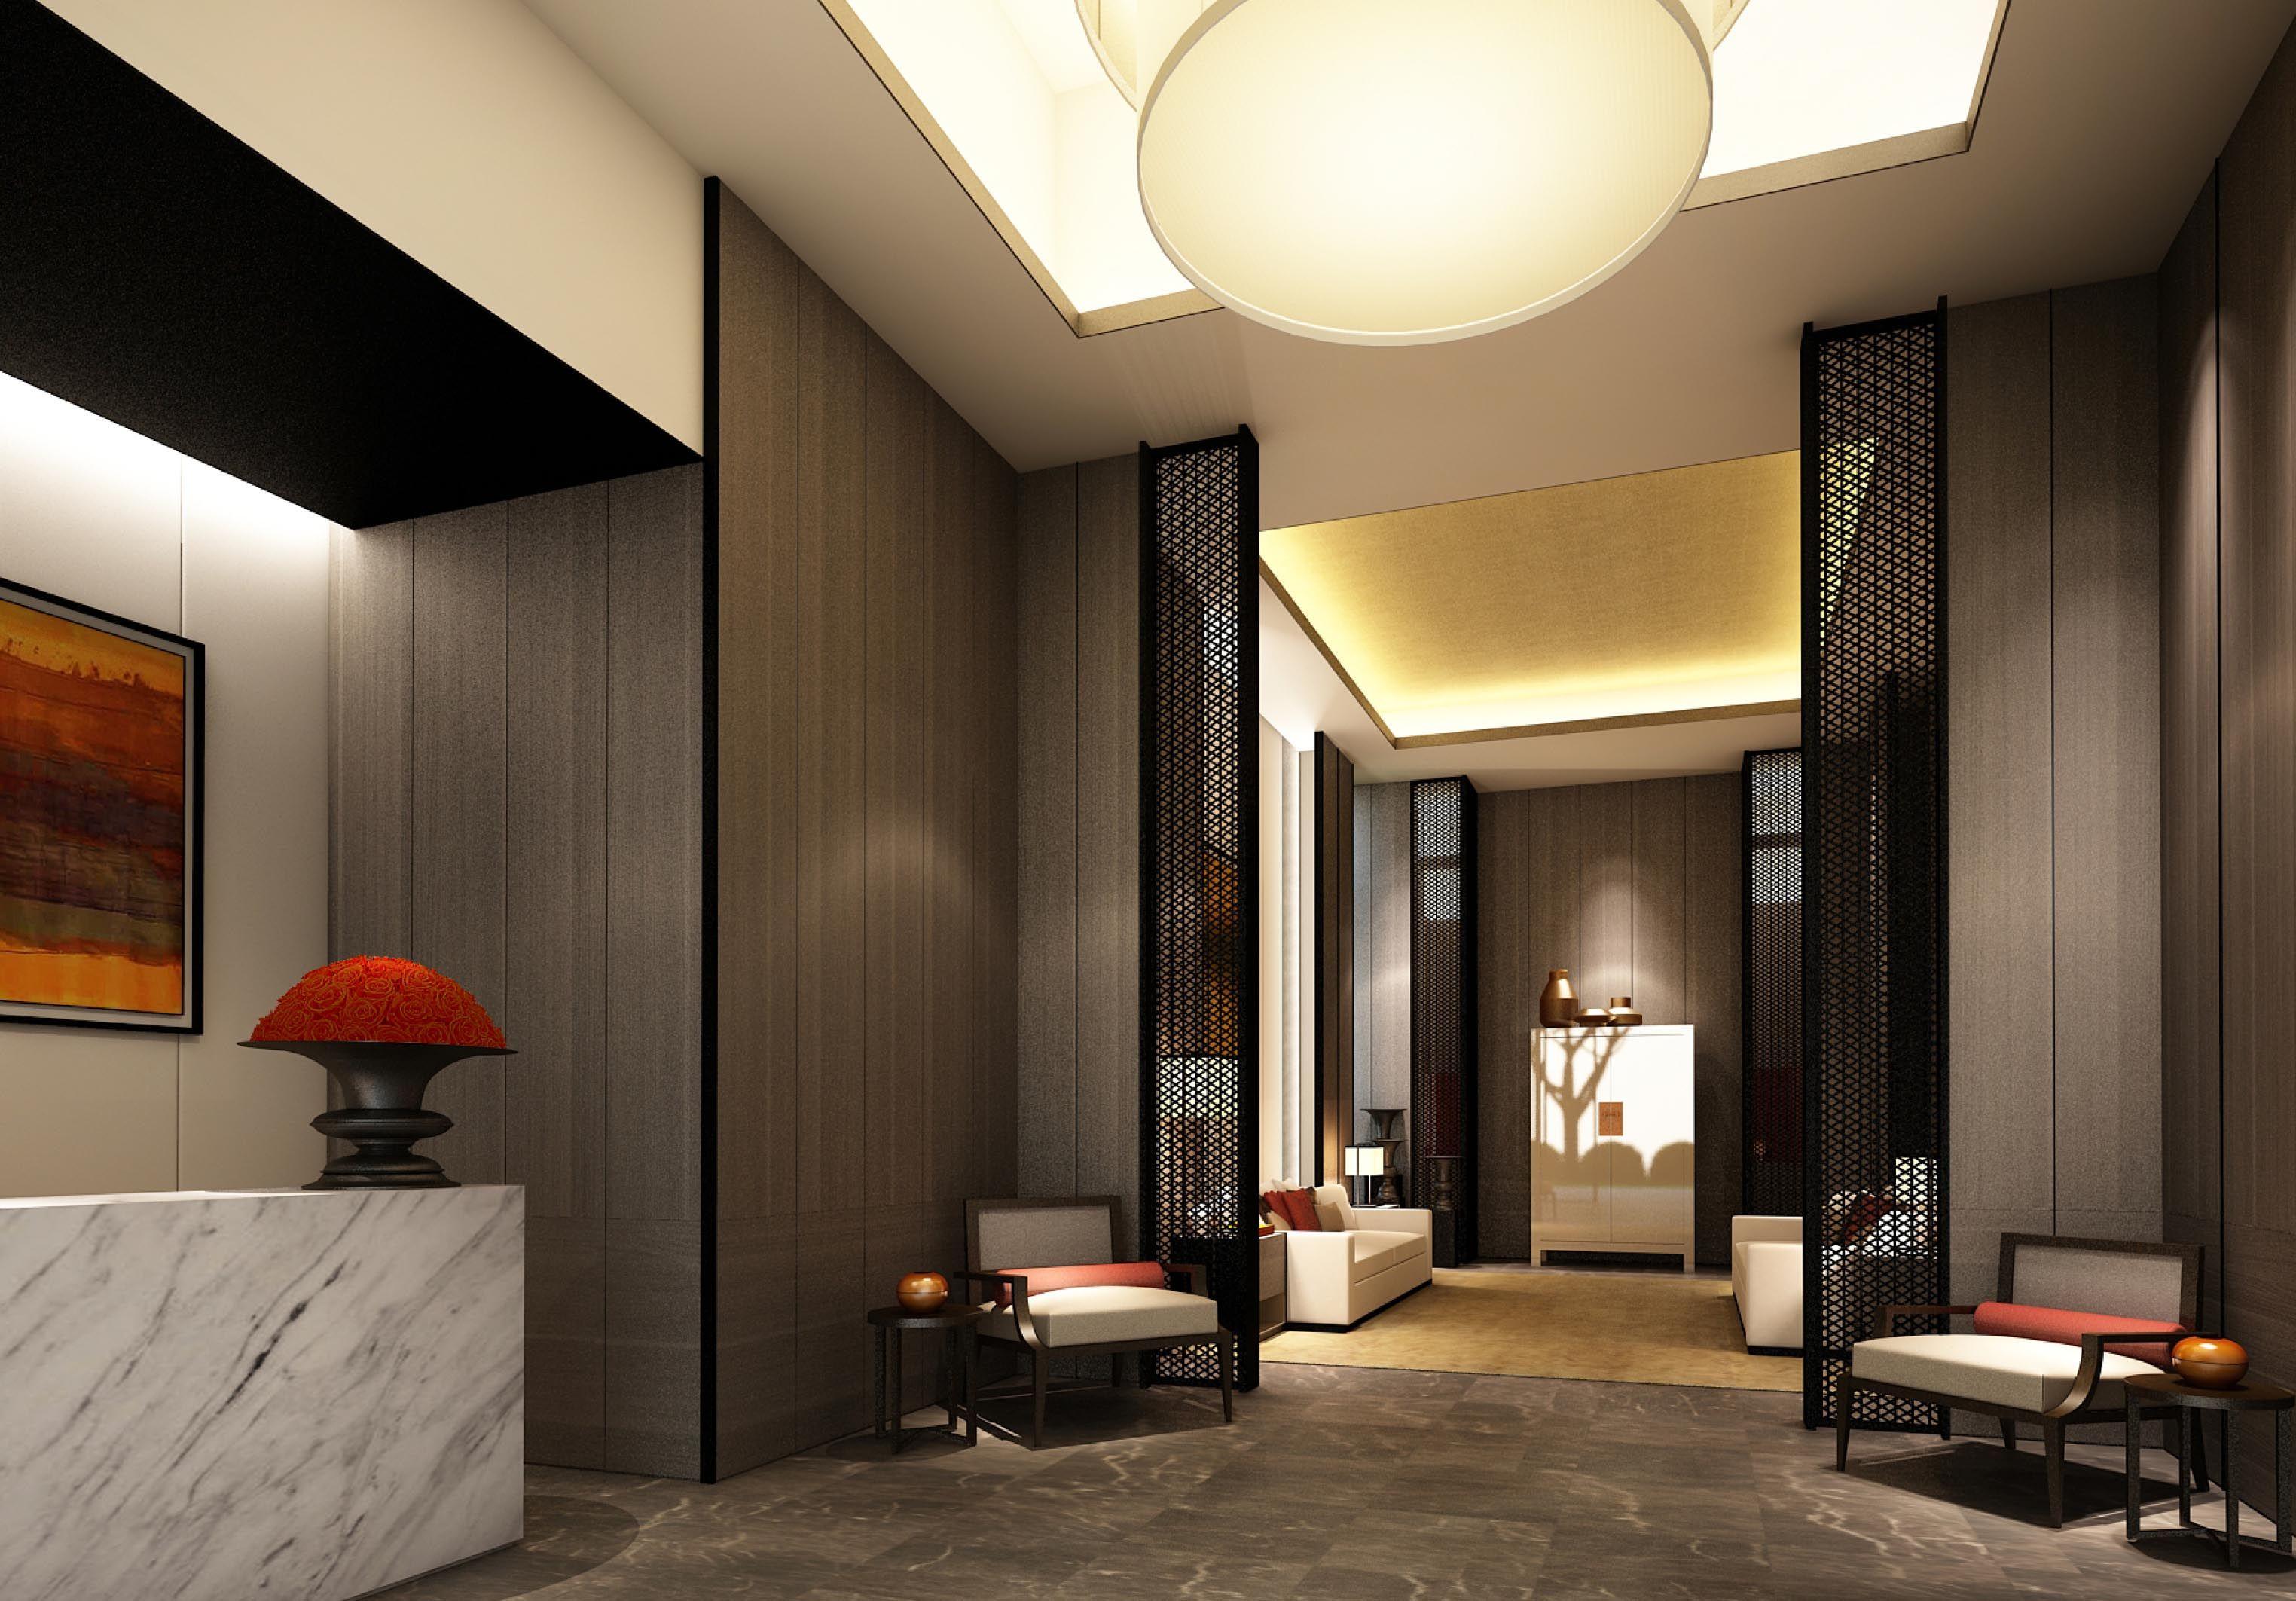 Apartment Interior Design Jakarta scda gcmn apartments, jakarta, indonesia | luxury residences